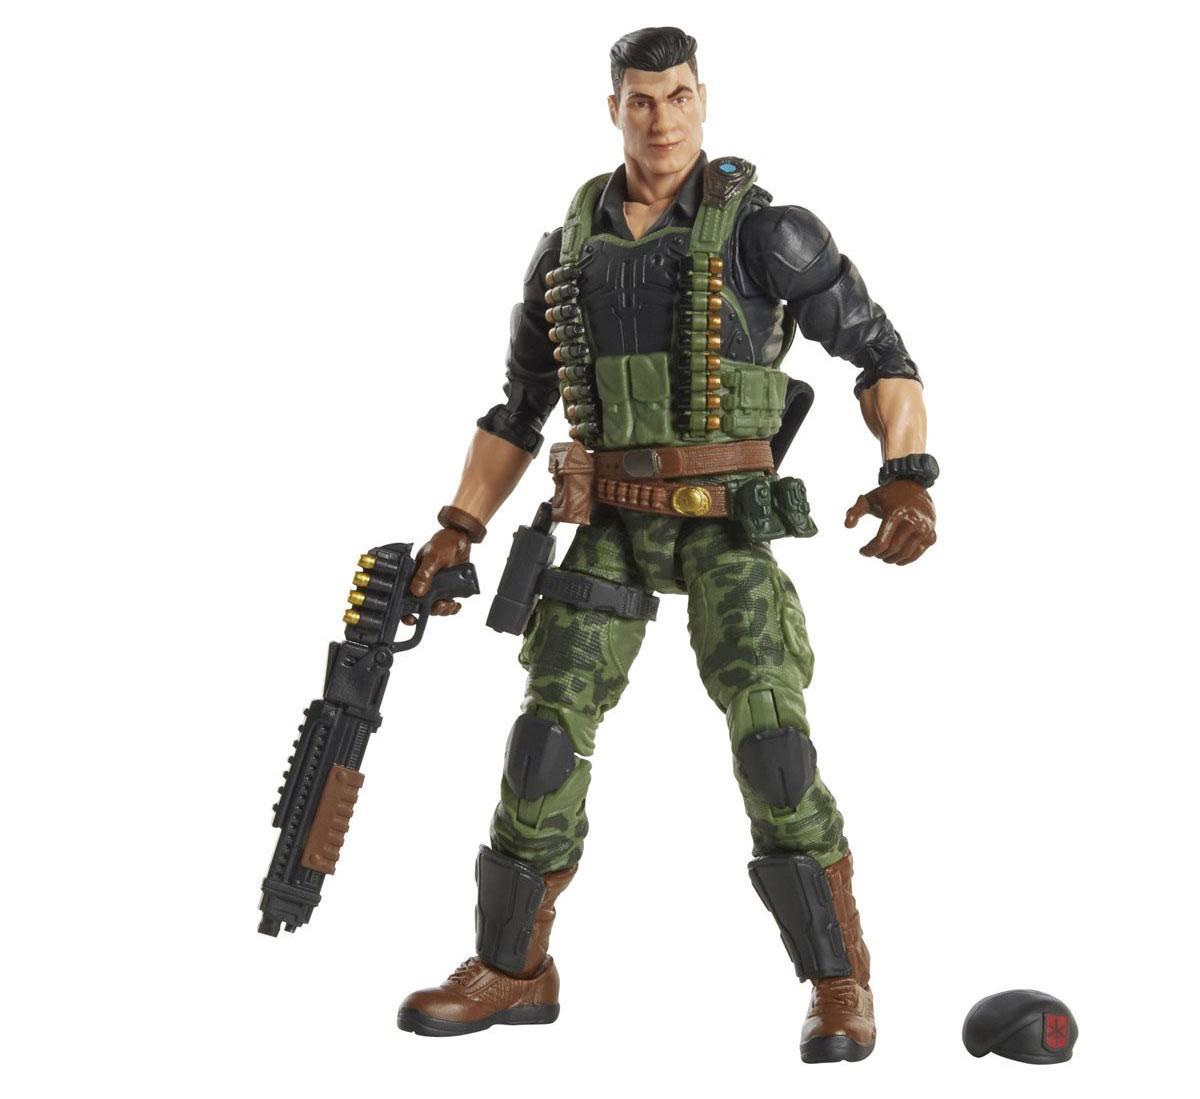 gi-joe-classified-series-flint-action-figure-1